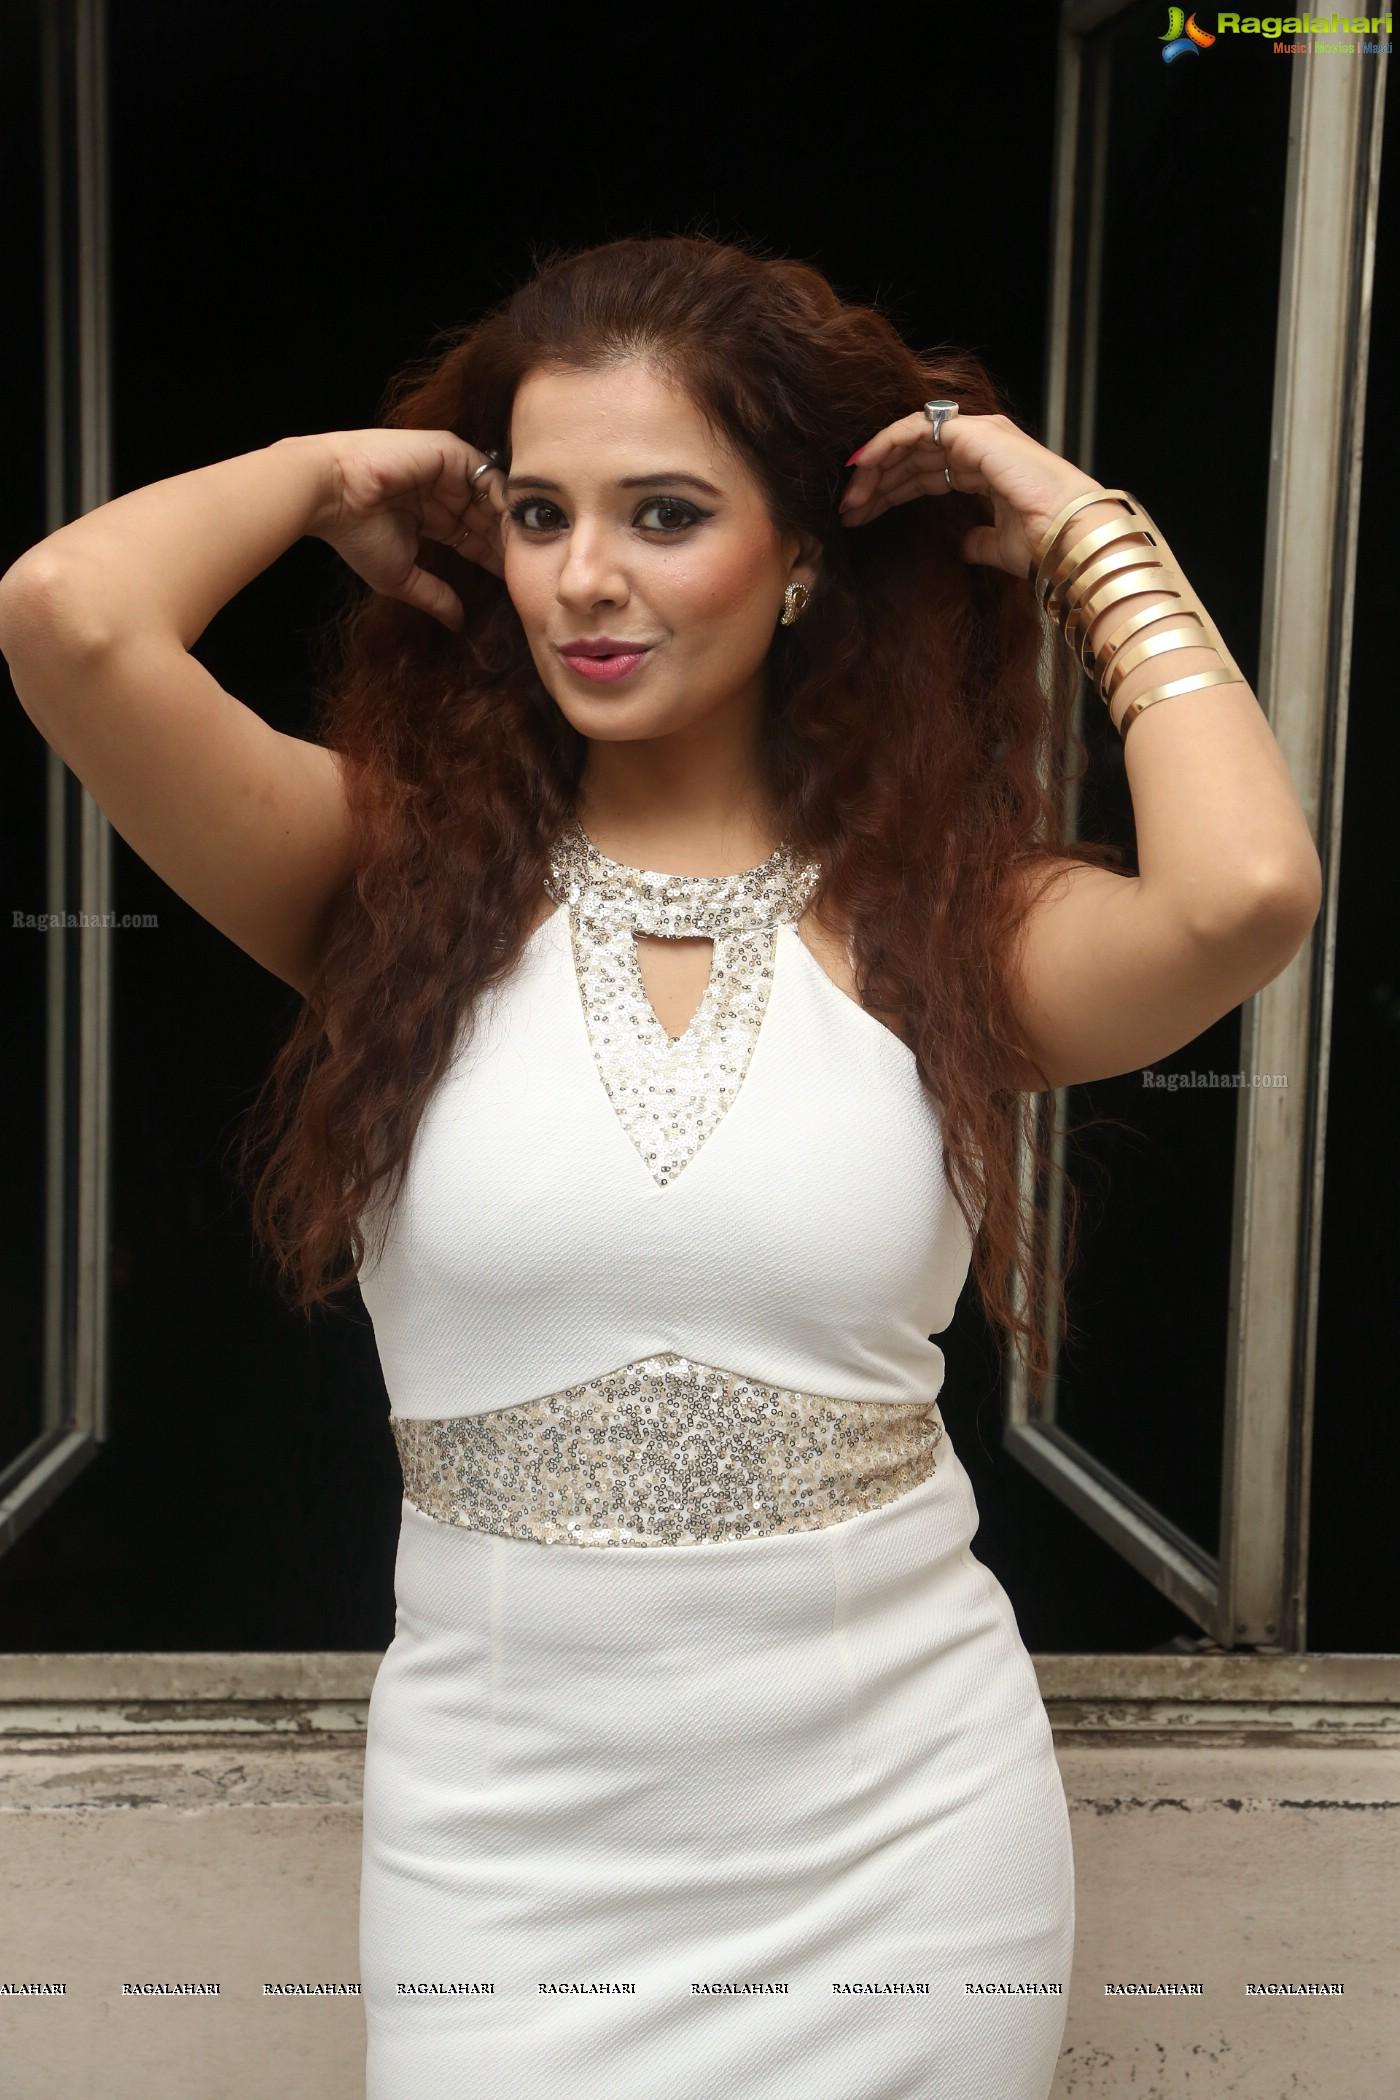 Saloni Aswani nudes (84 pics), young Pussy, iCloud, cameltoe 2016